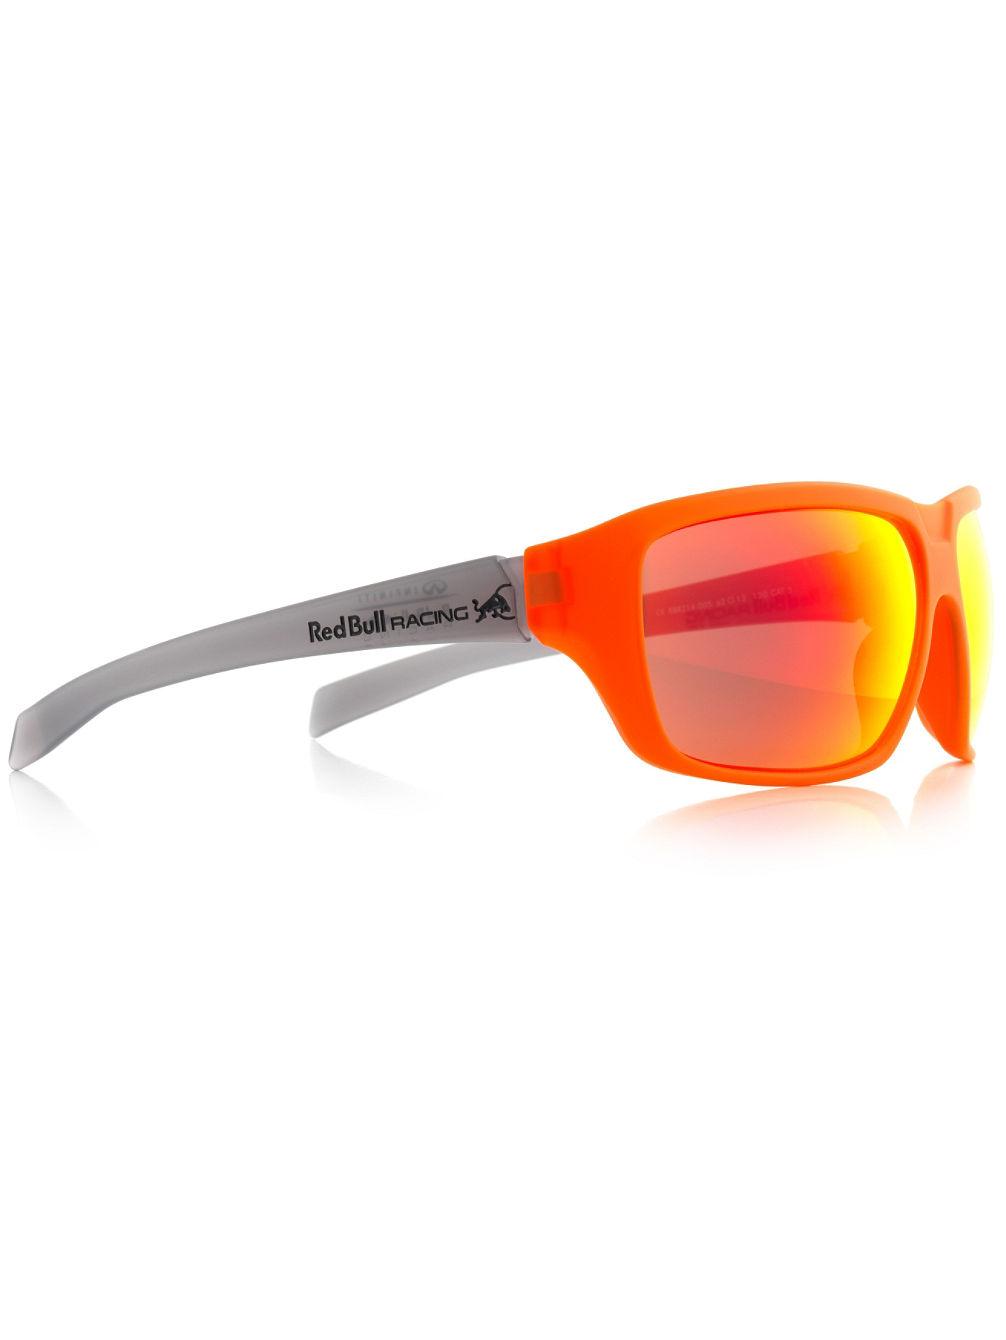 red-bull-racing-eyewear-rbr214-orange